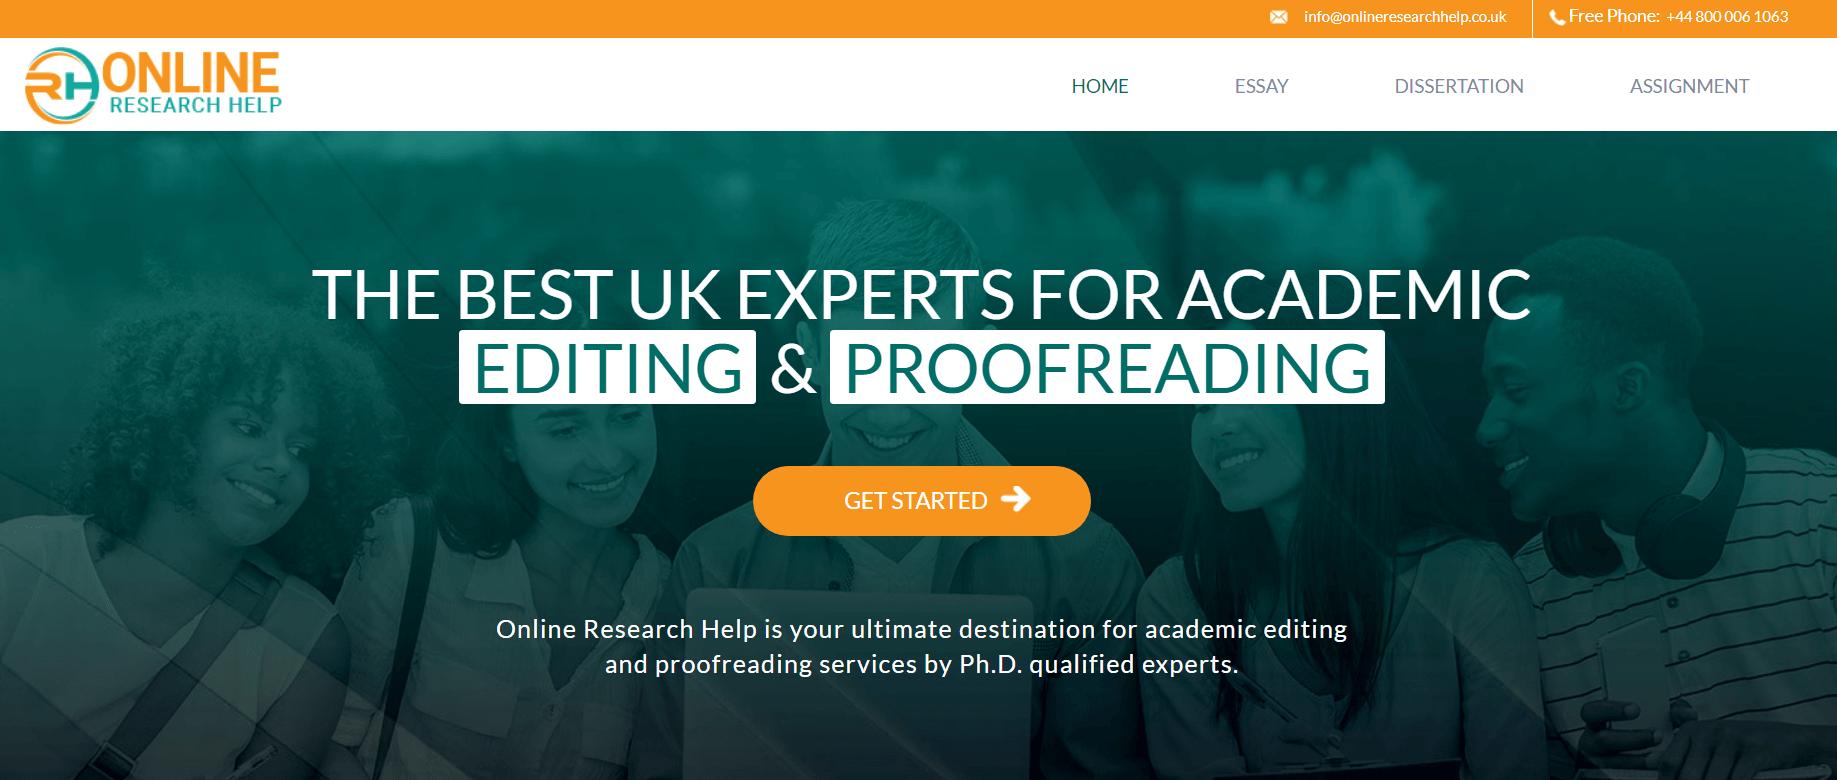 onlineresearchhelp.co.uk